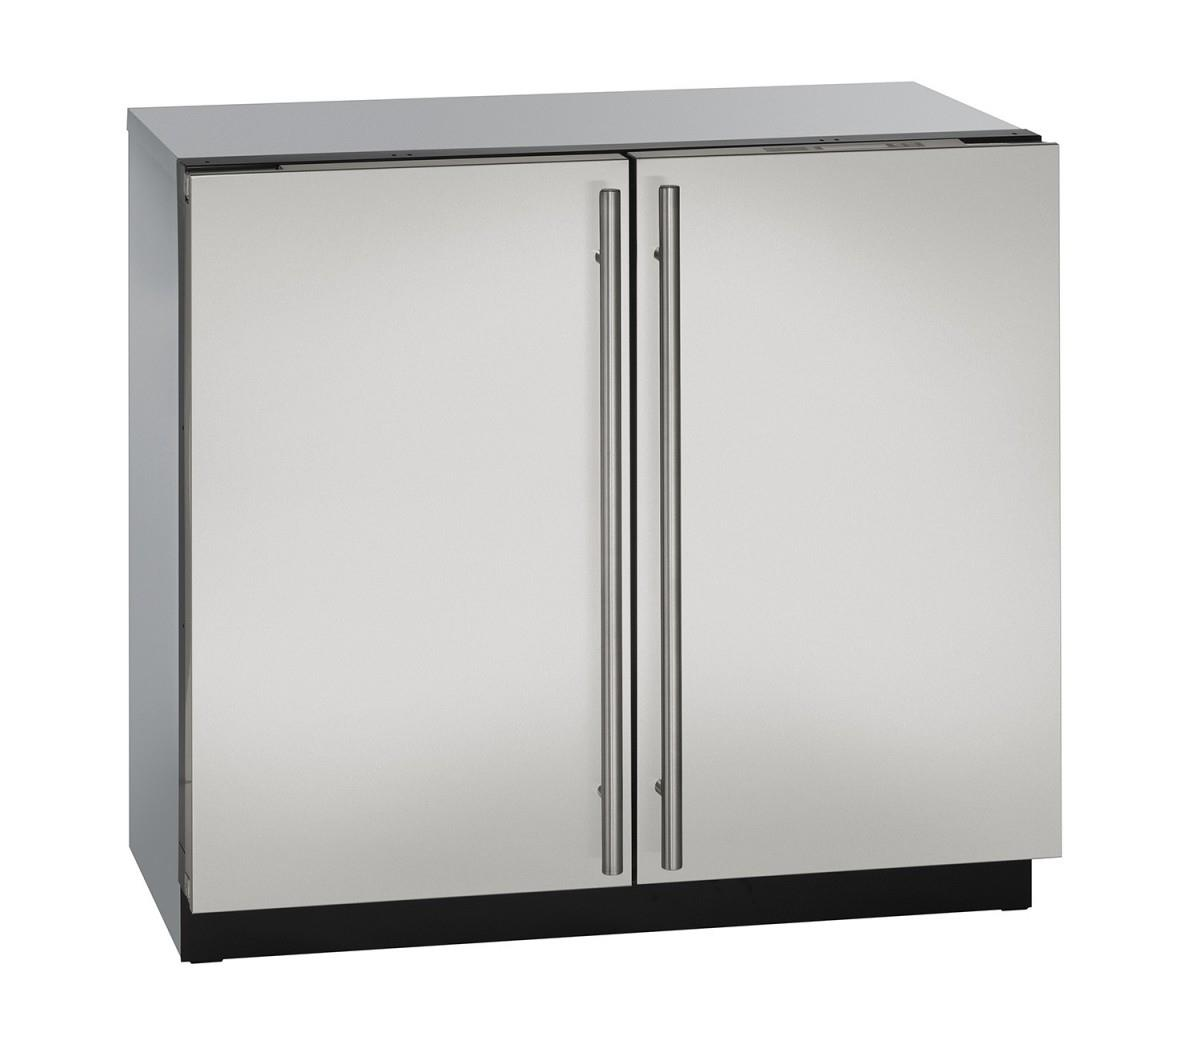 "U-Line Refrigerators 36"" Solid Double Door Compact Refrigerator - Item Number: U-3036RRS-00A"